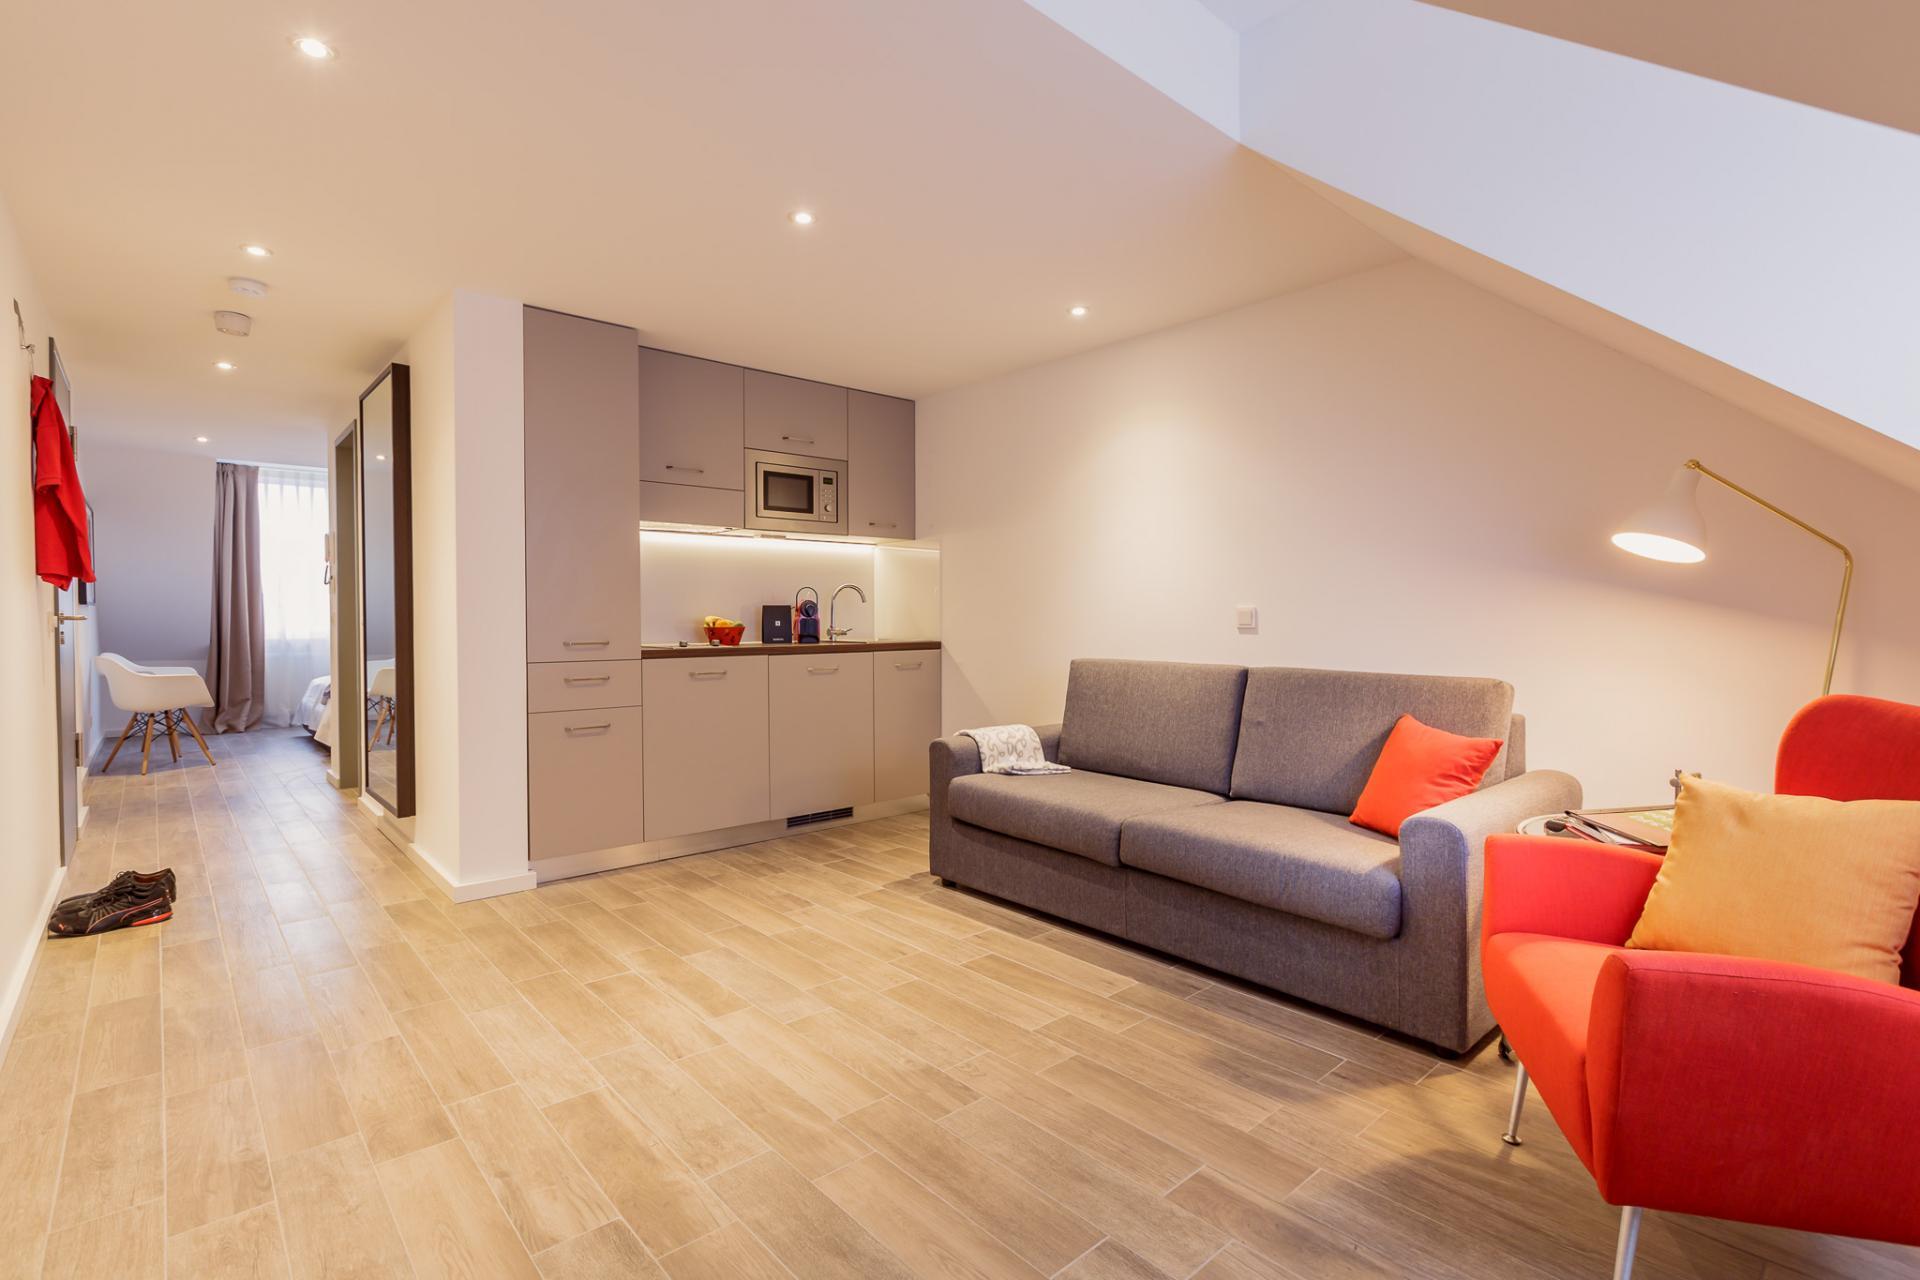 Sofa at Brera Elbestrasse 29 - Citybase Apartments